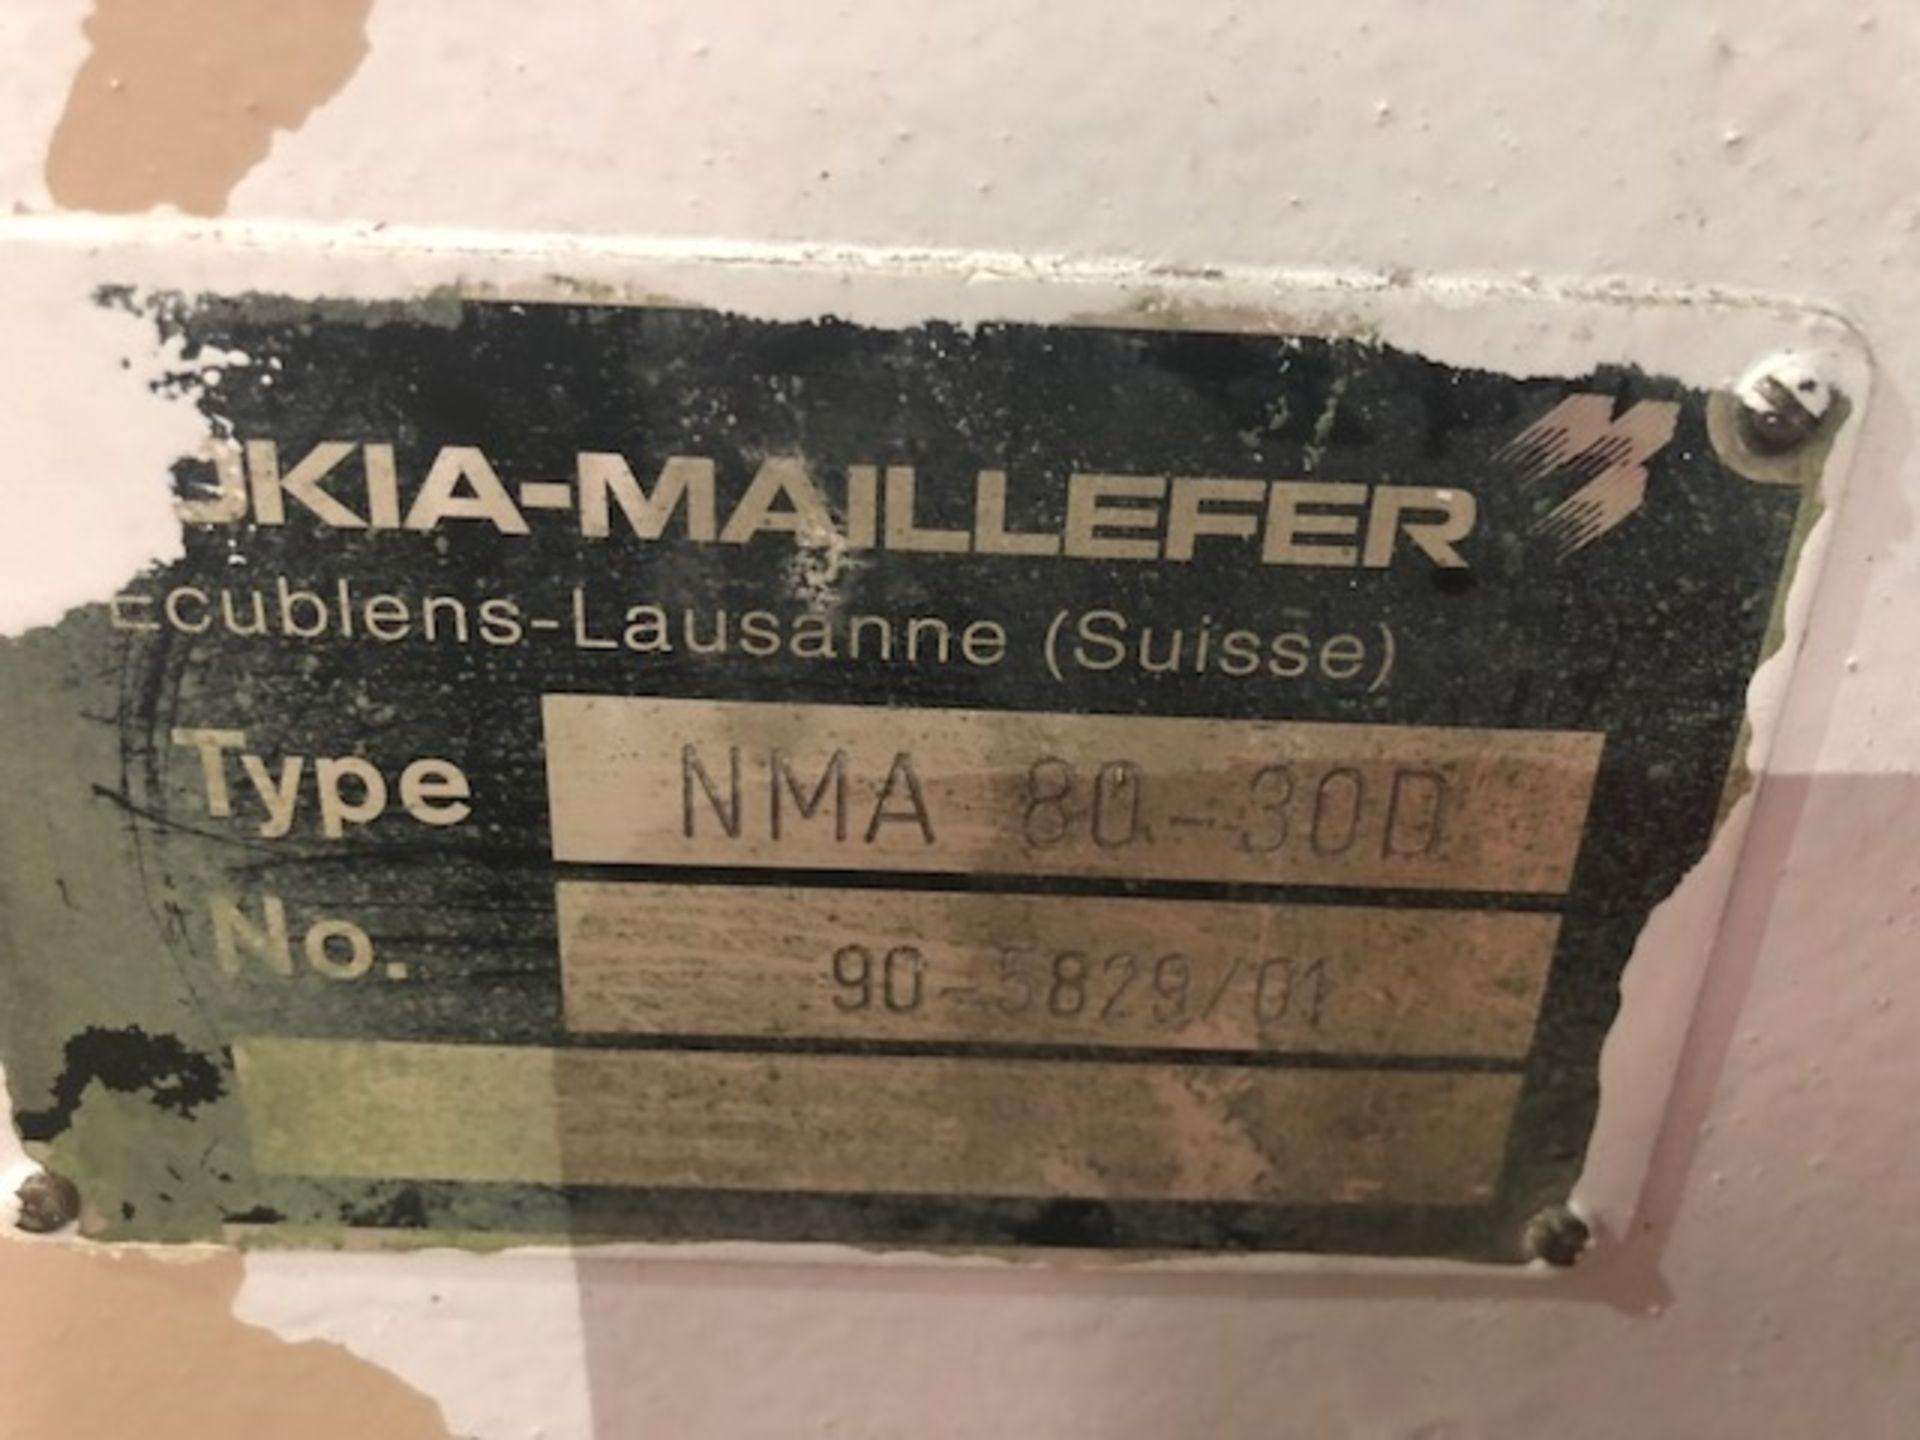 Lot 103 - Nokia Maillefer Extruder 80mm